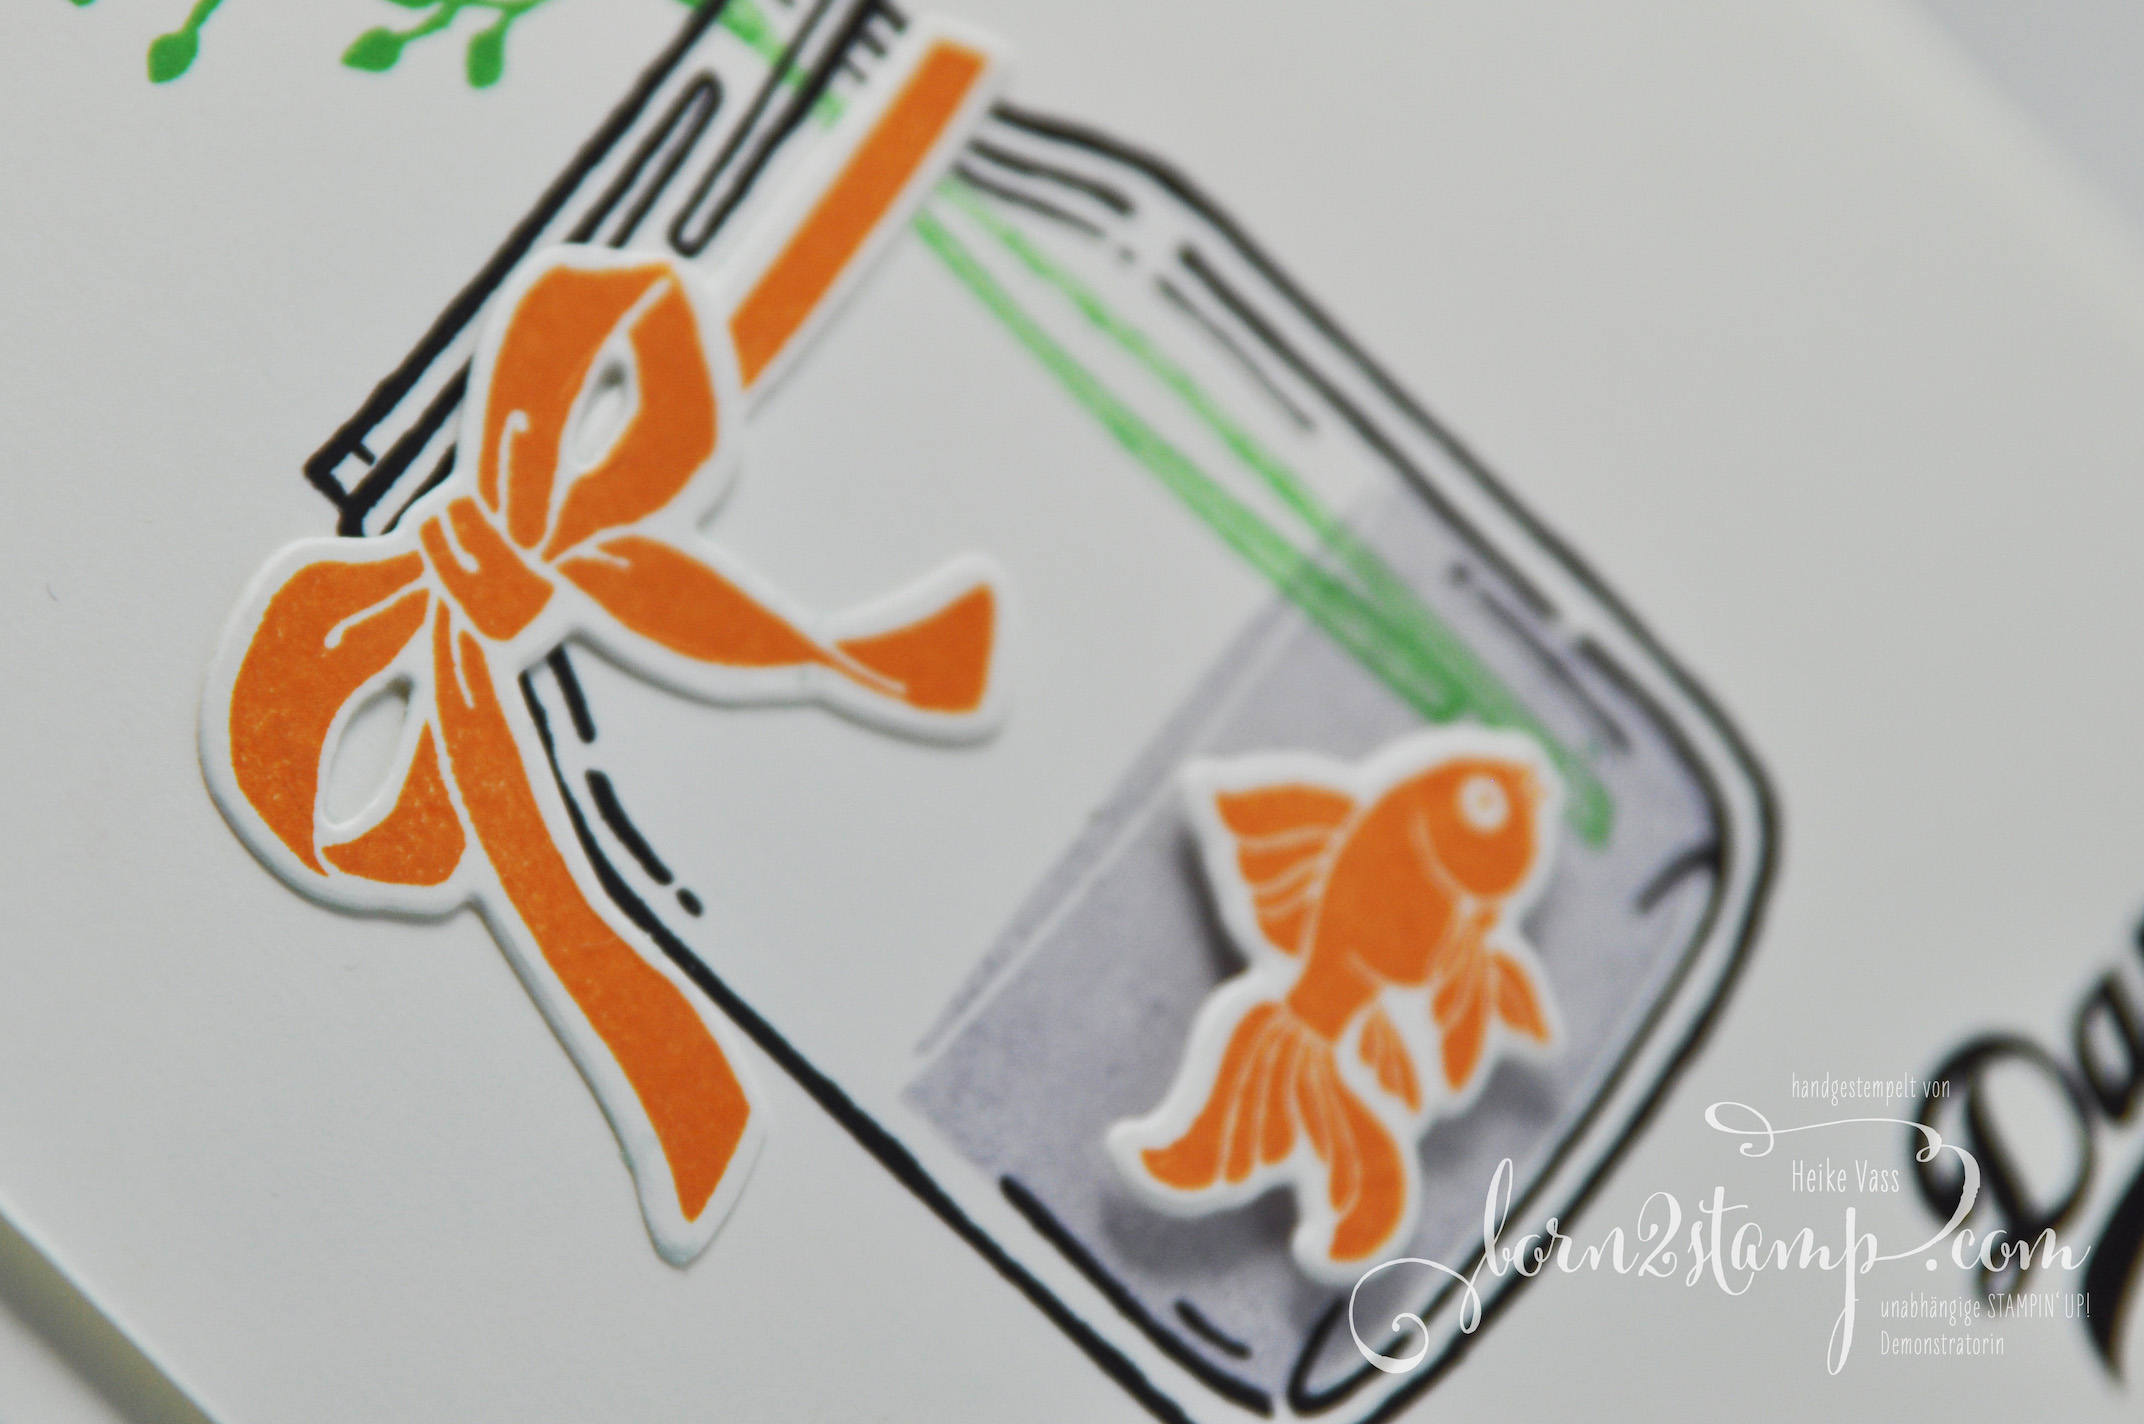 born2stamp-stampin-up-inkspire_me-dankeskarte-glasklare-gruesse-everyday-jars-framelits